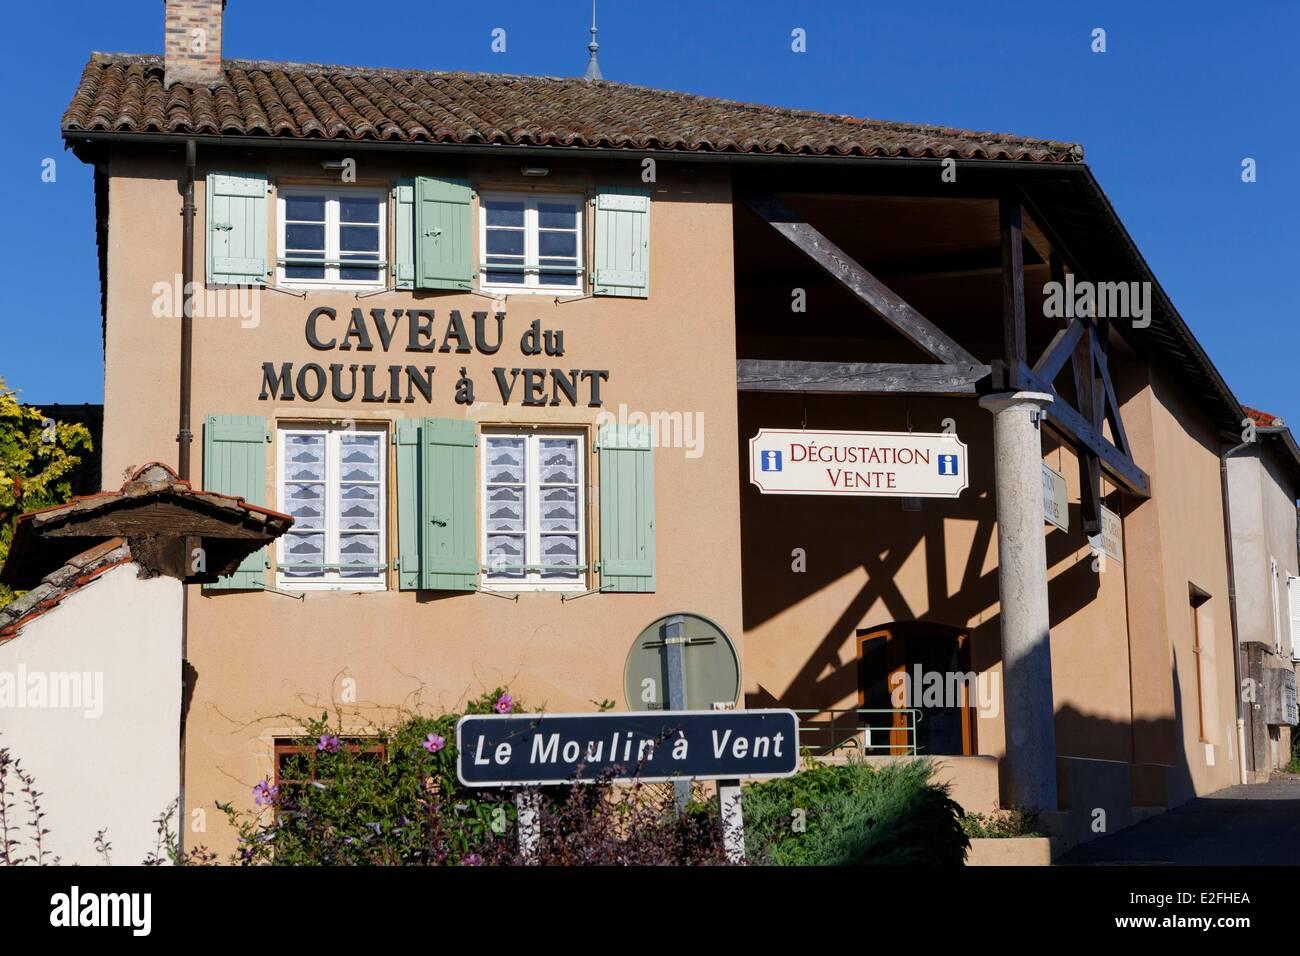 Cellar Sign Stockfotos & Cellar Sign Bilder - Alamy